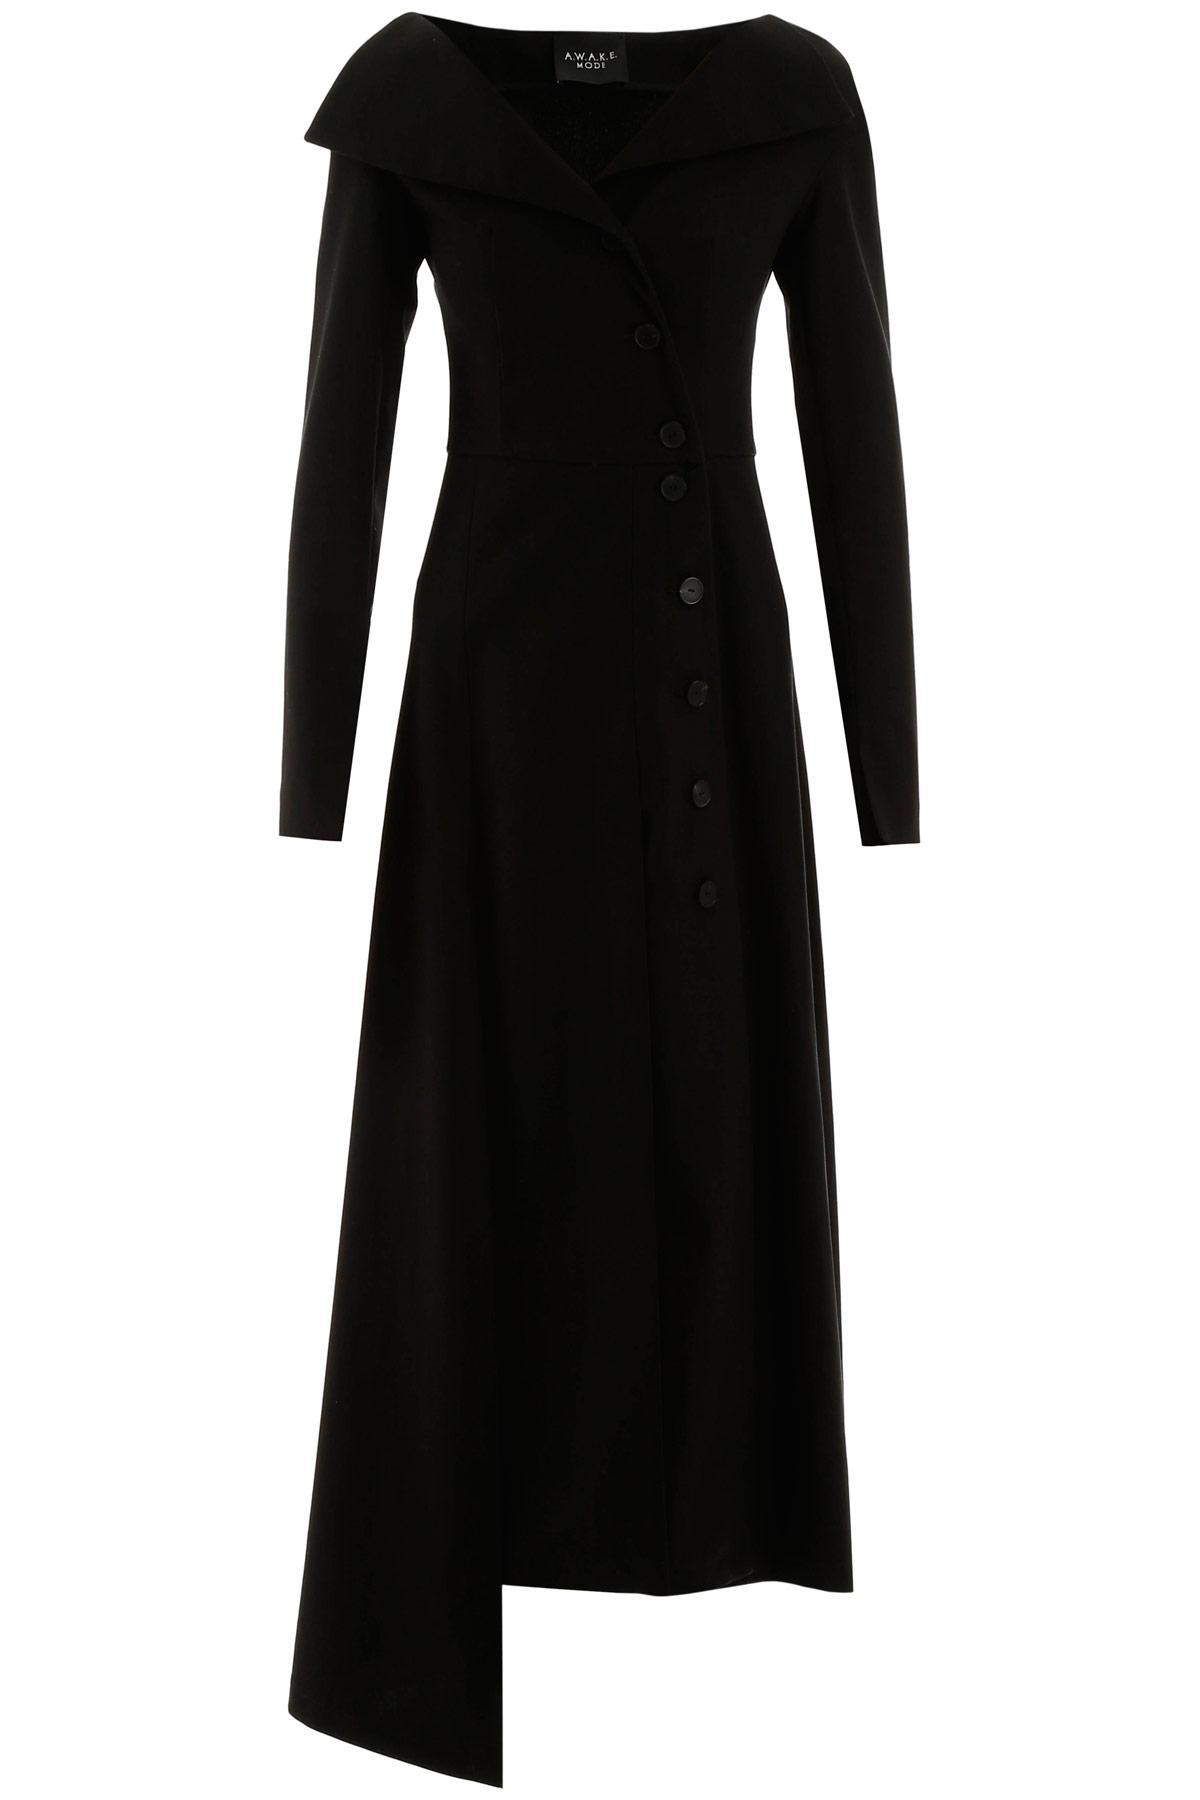 A.W.A.K.E. MODE BUTTONED DRESS 38 Black Cotton